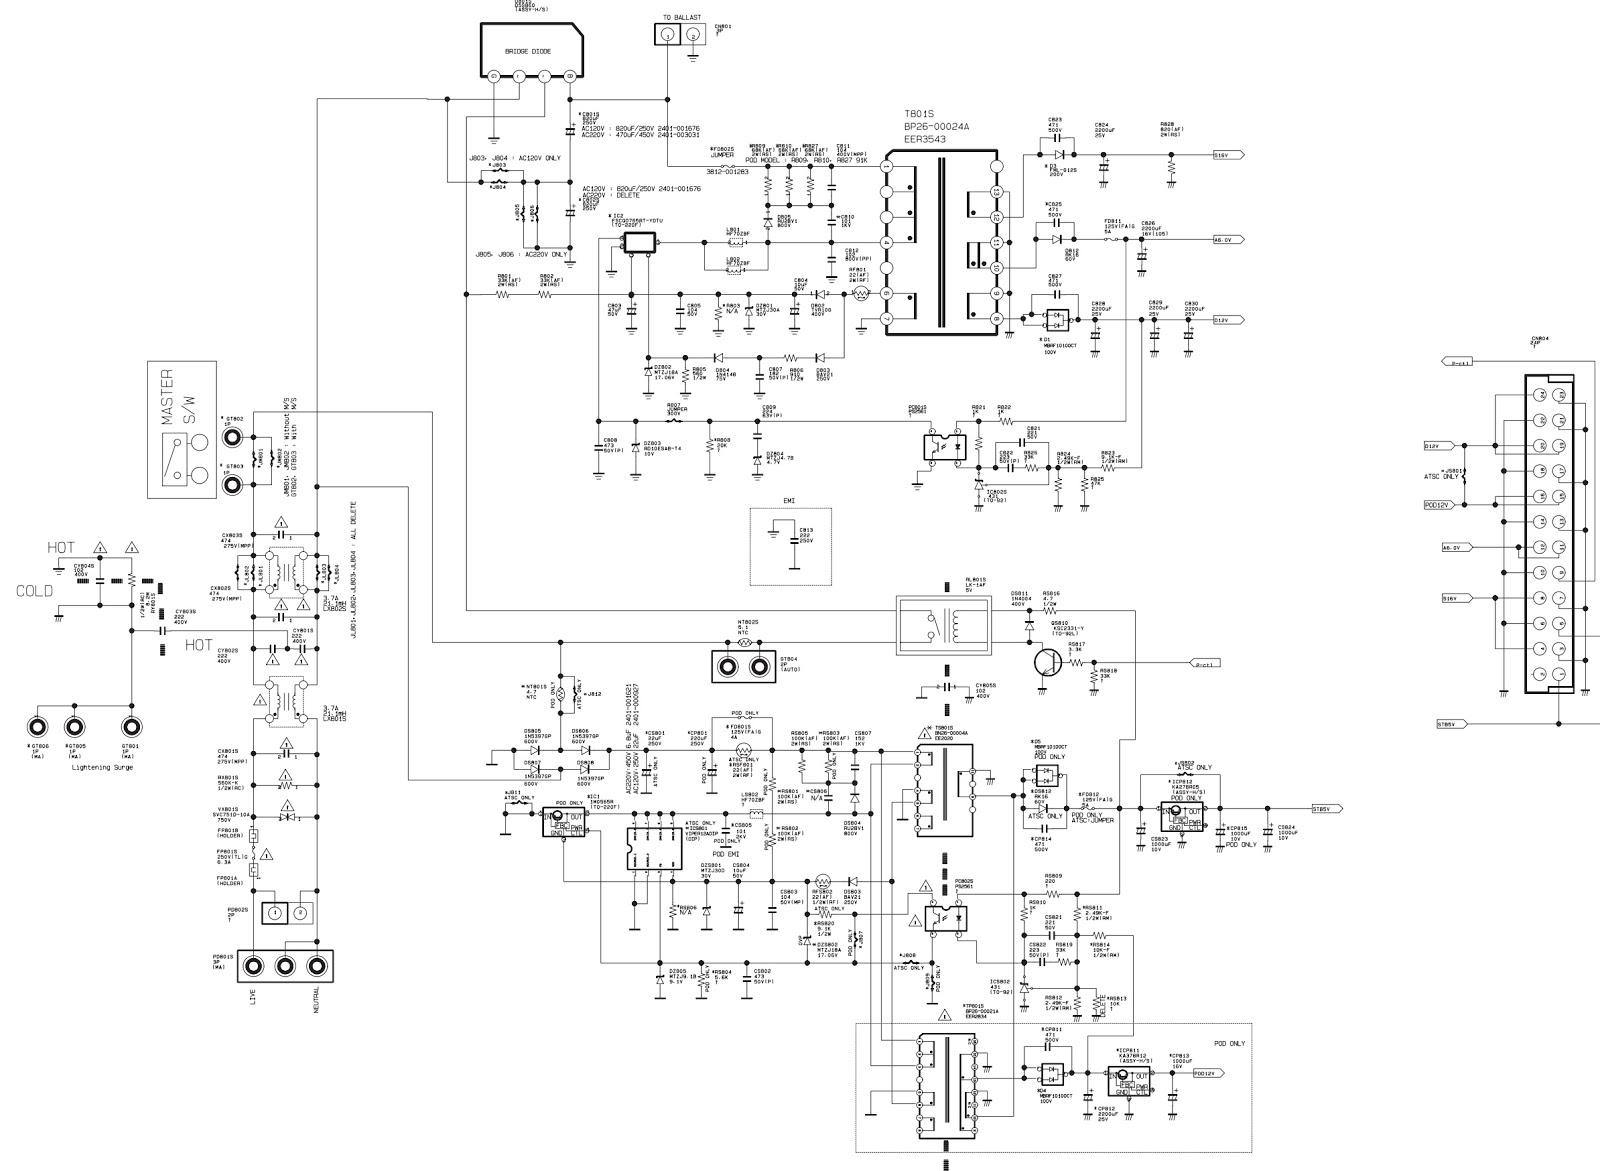 small resolution of samsung dlp wiring diagram wiring diagram info samsung dlp wiring diagram